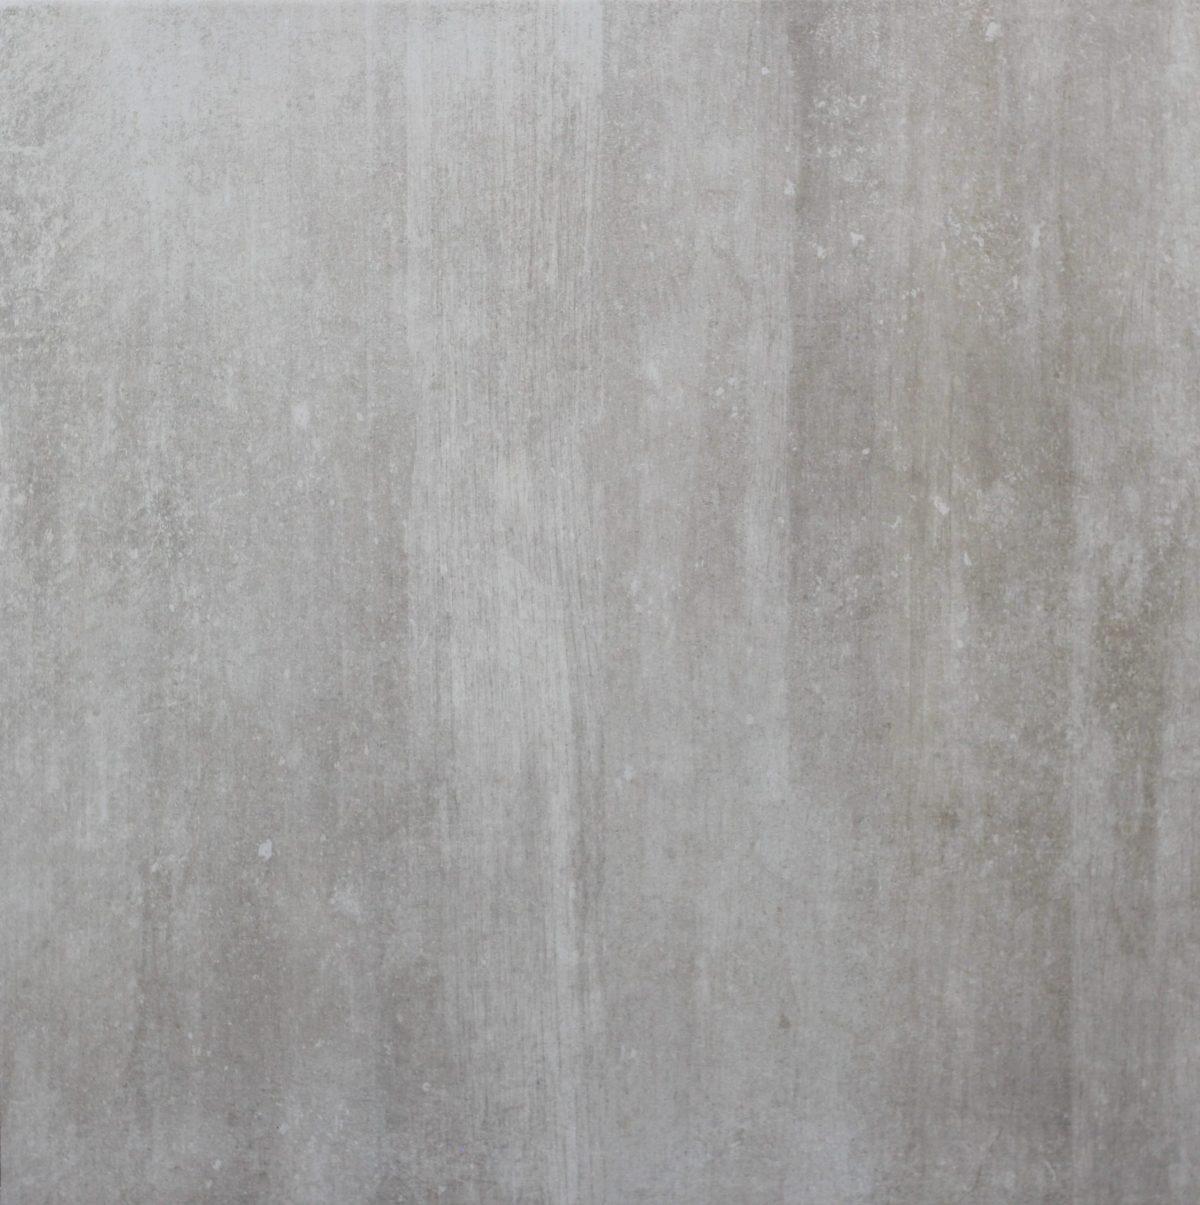 A WOODCRETE NCIA GREIGE MATT 450x450mm